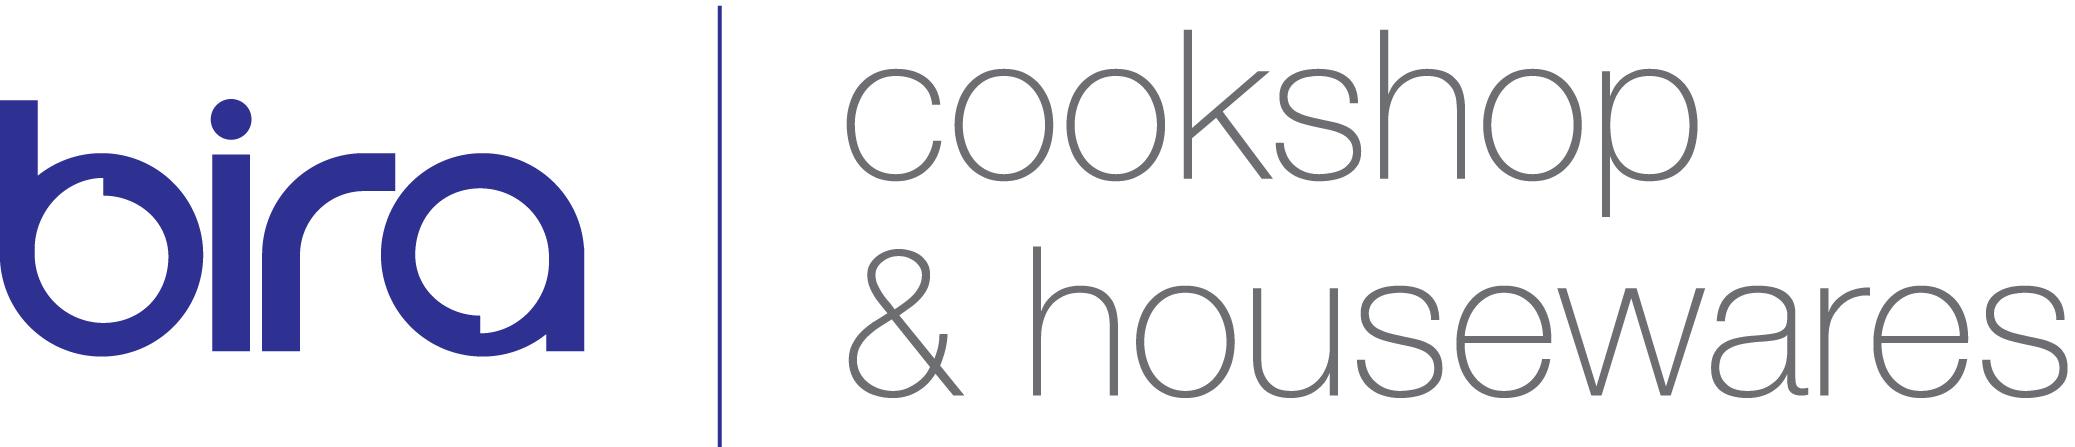 Cookshop & Housewares Logo